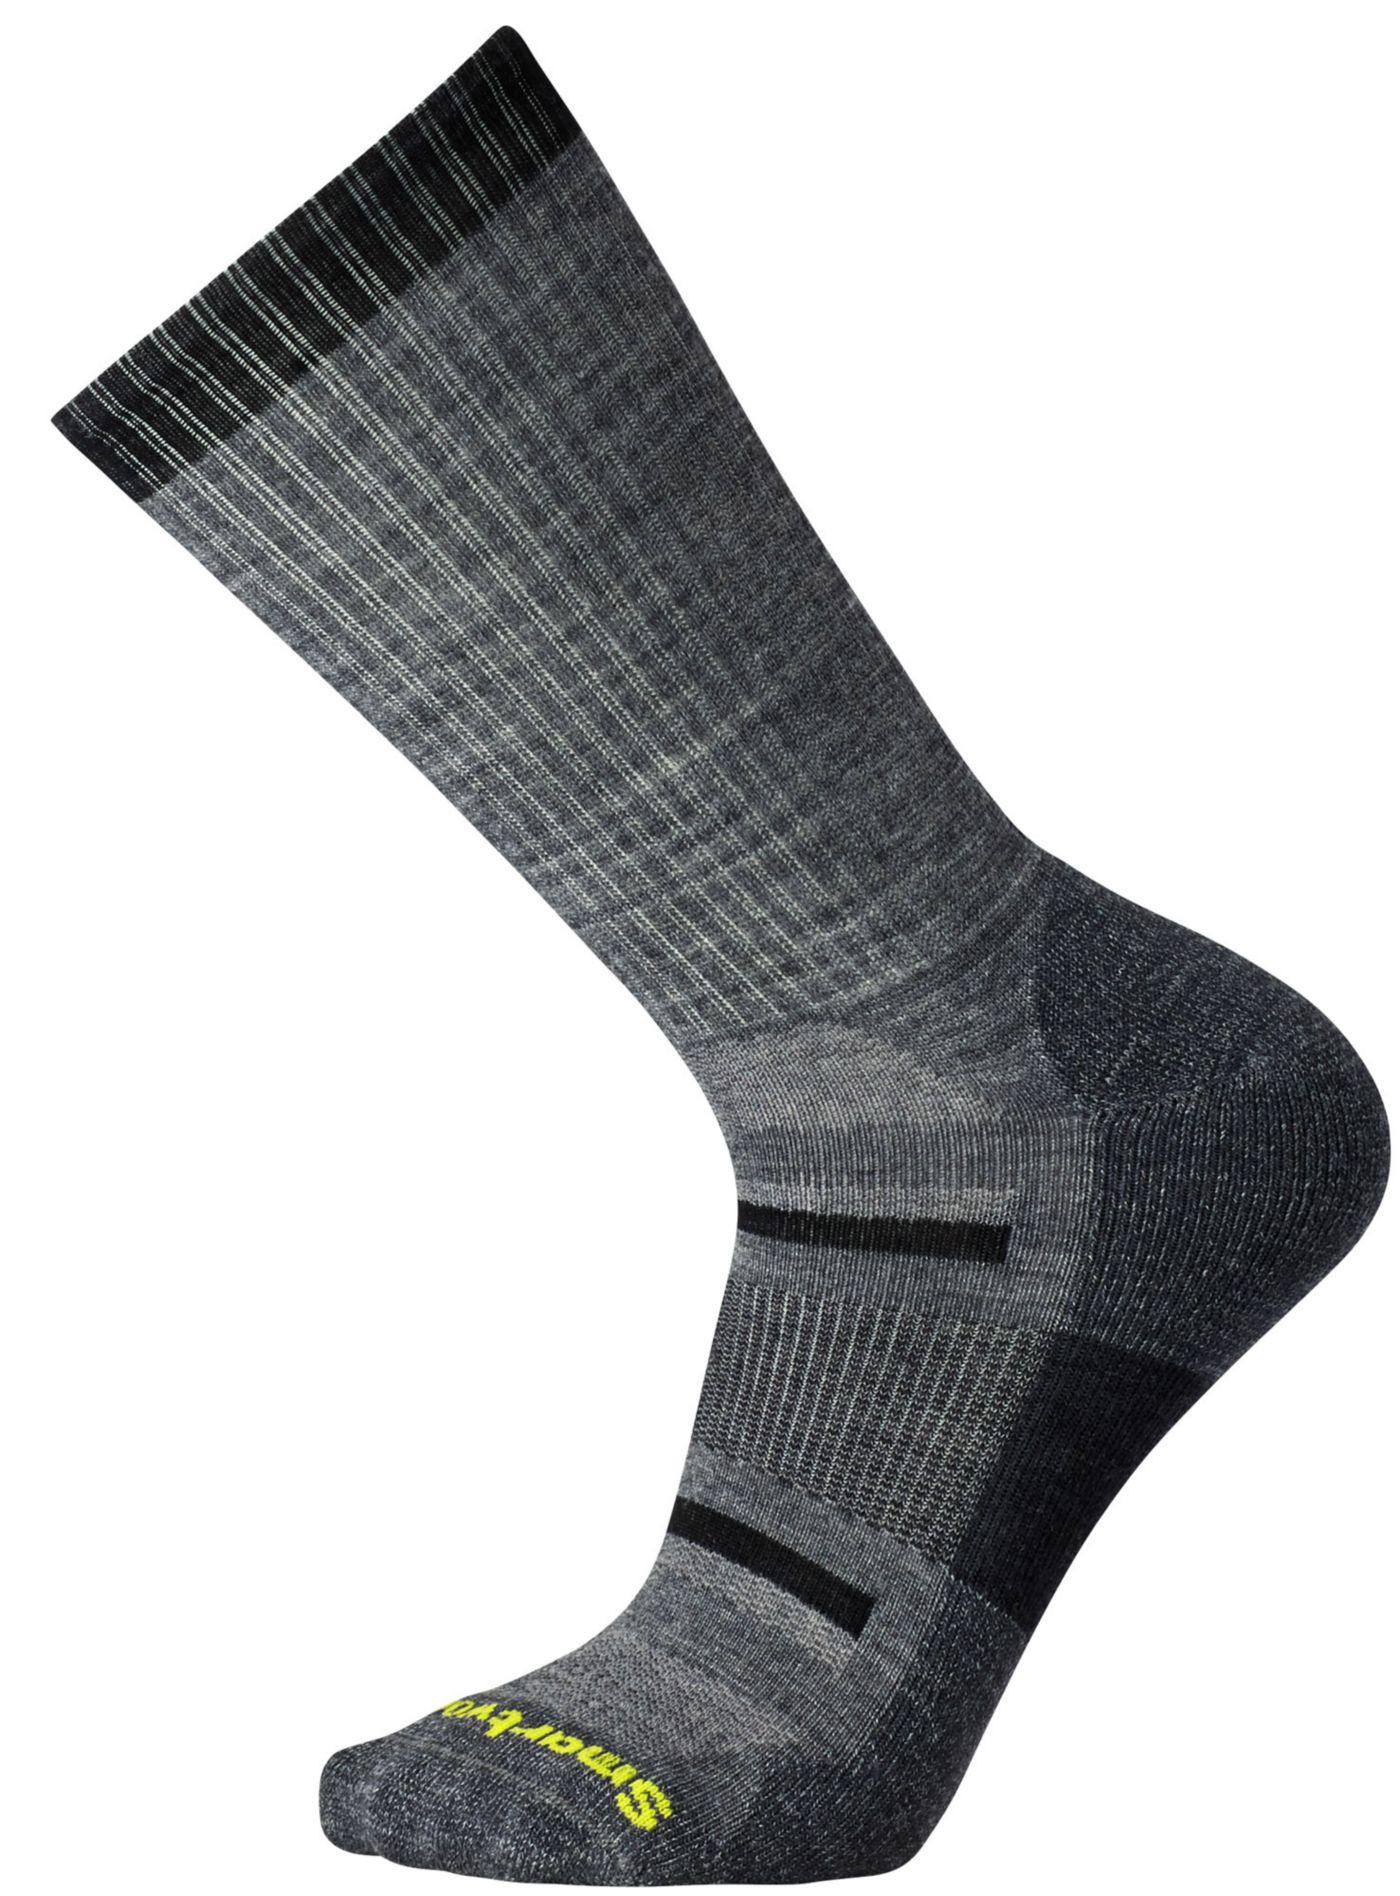 SmartWool Outdoor Advanced Light Crew Socks